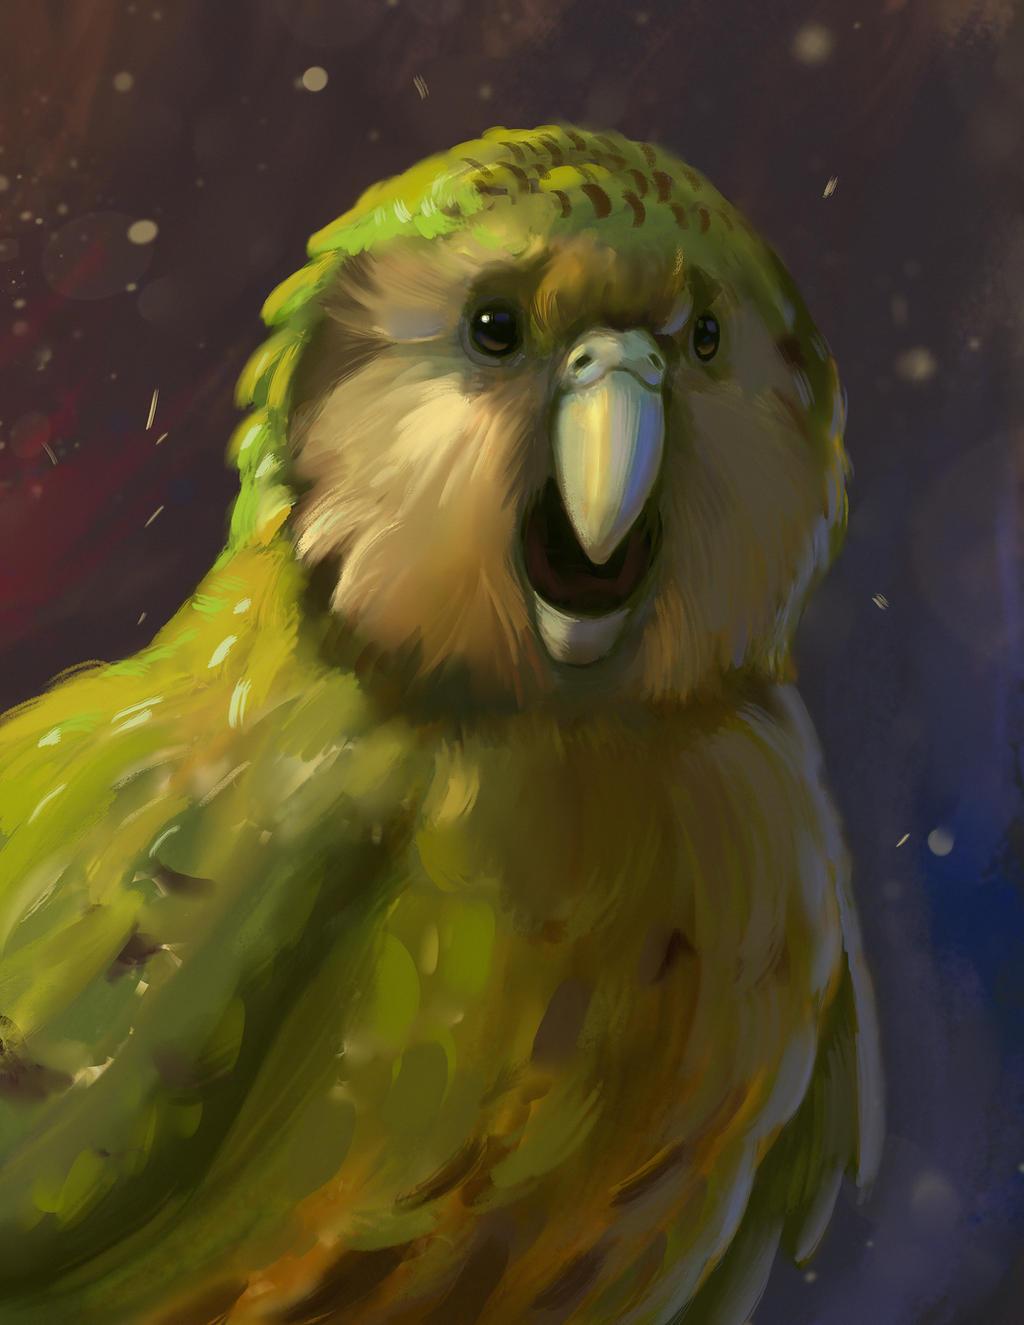 Kakapo by TylerJustice